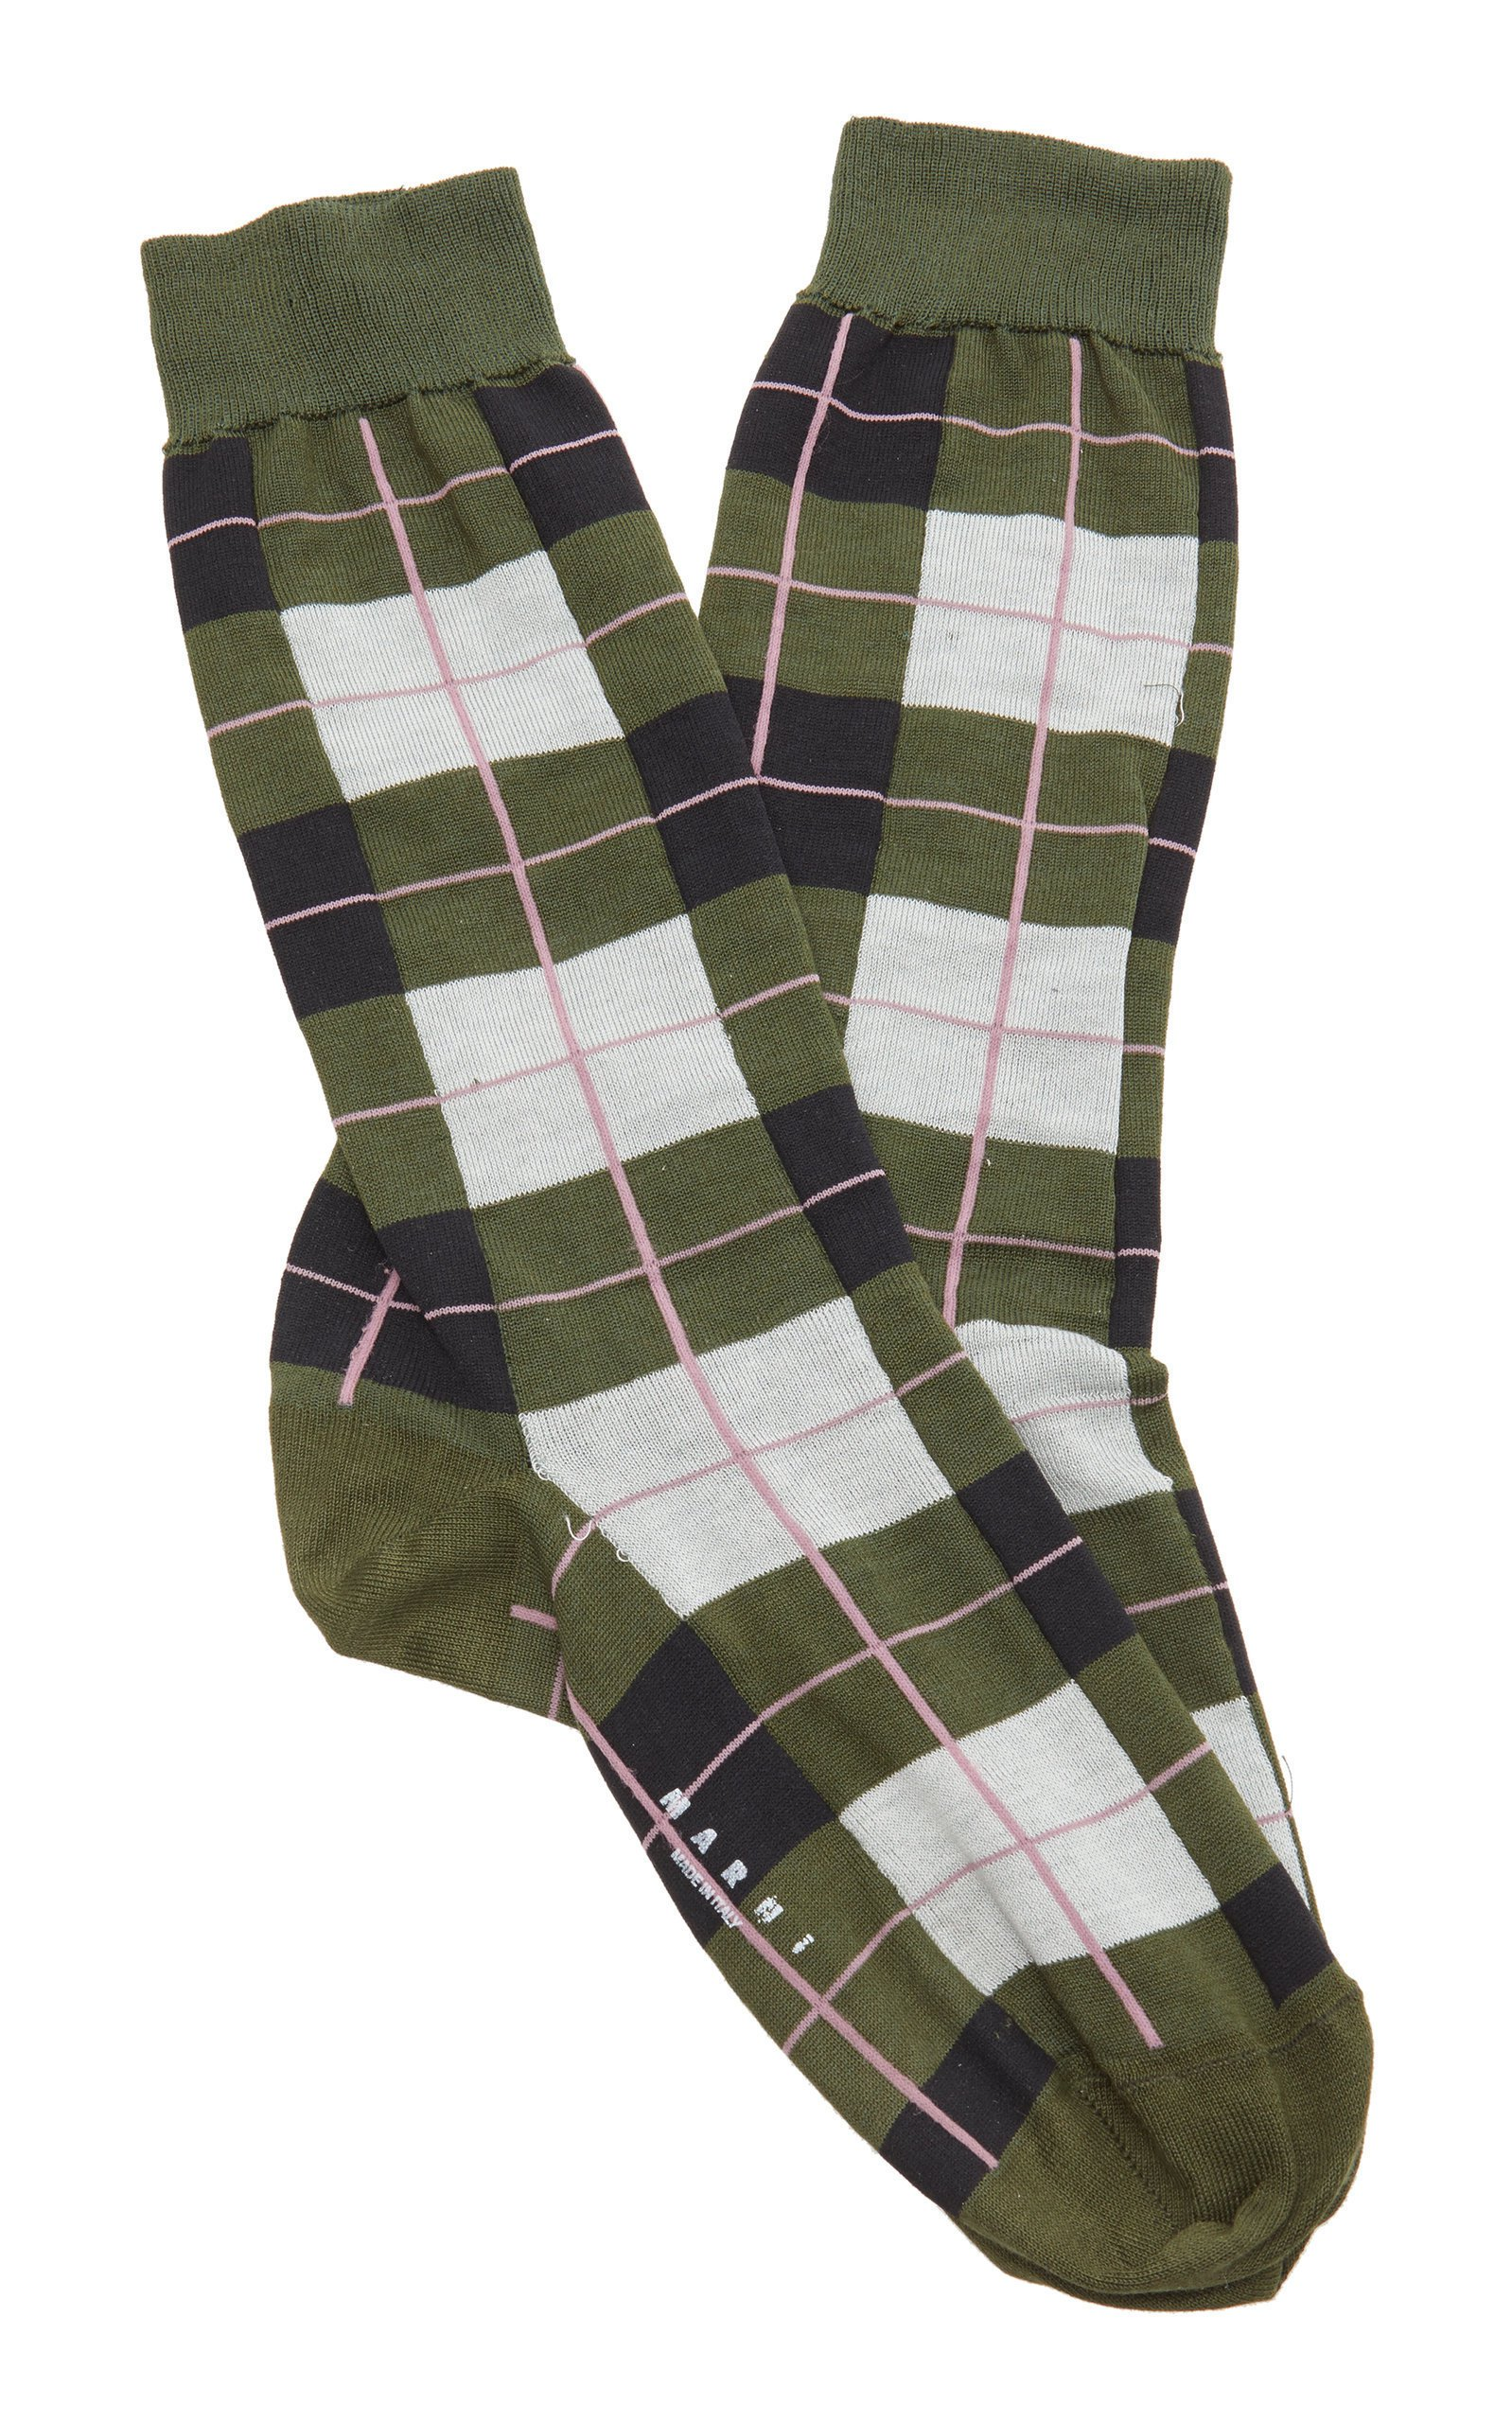 Marni Plaid Cotton-Blend Socks